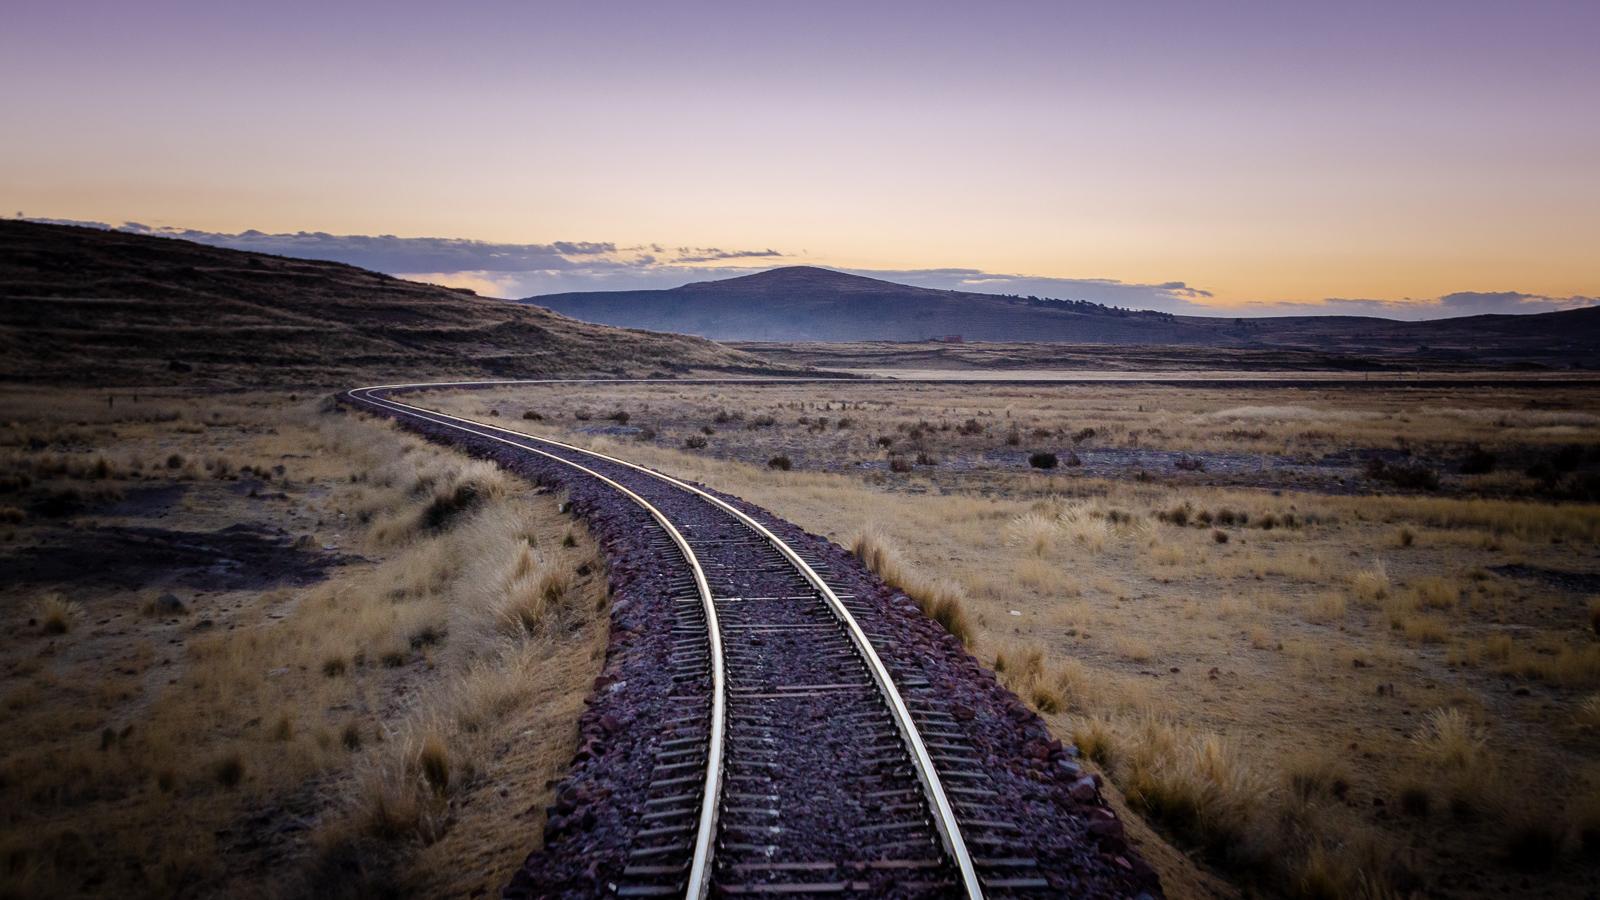 Towards Journey's End